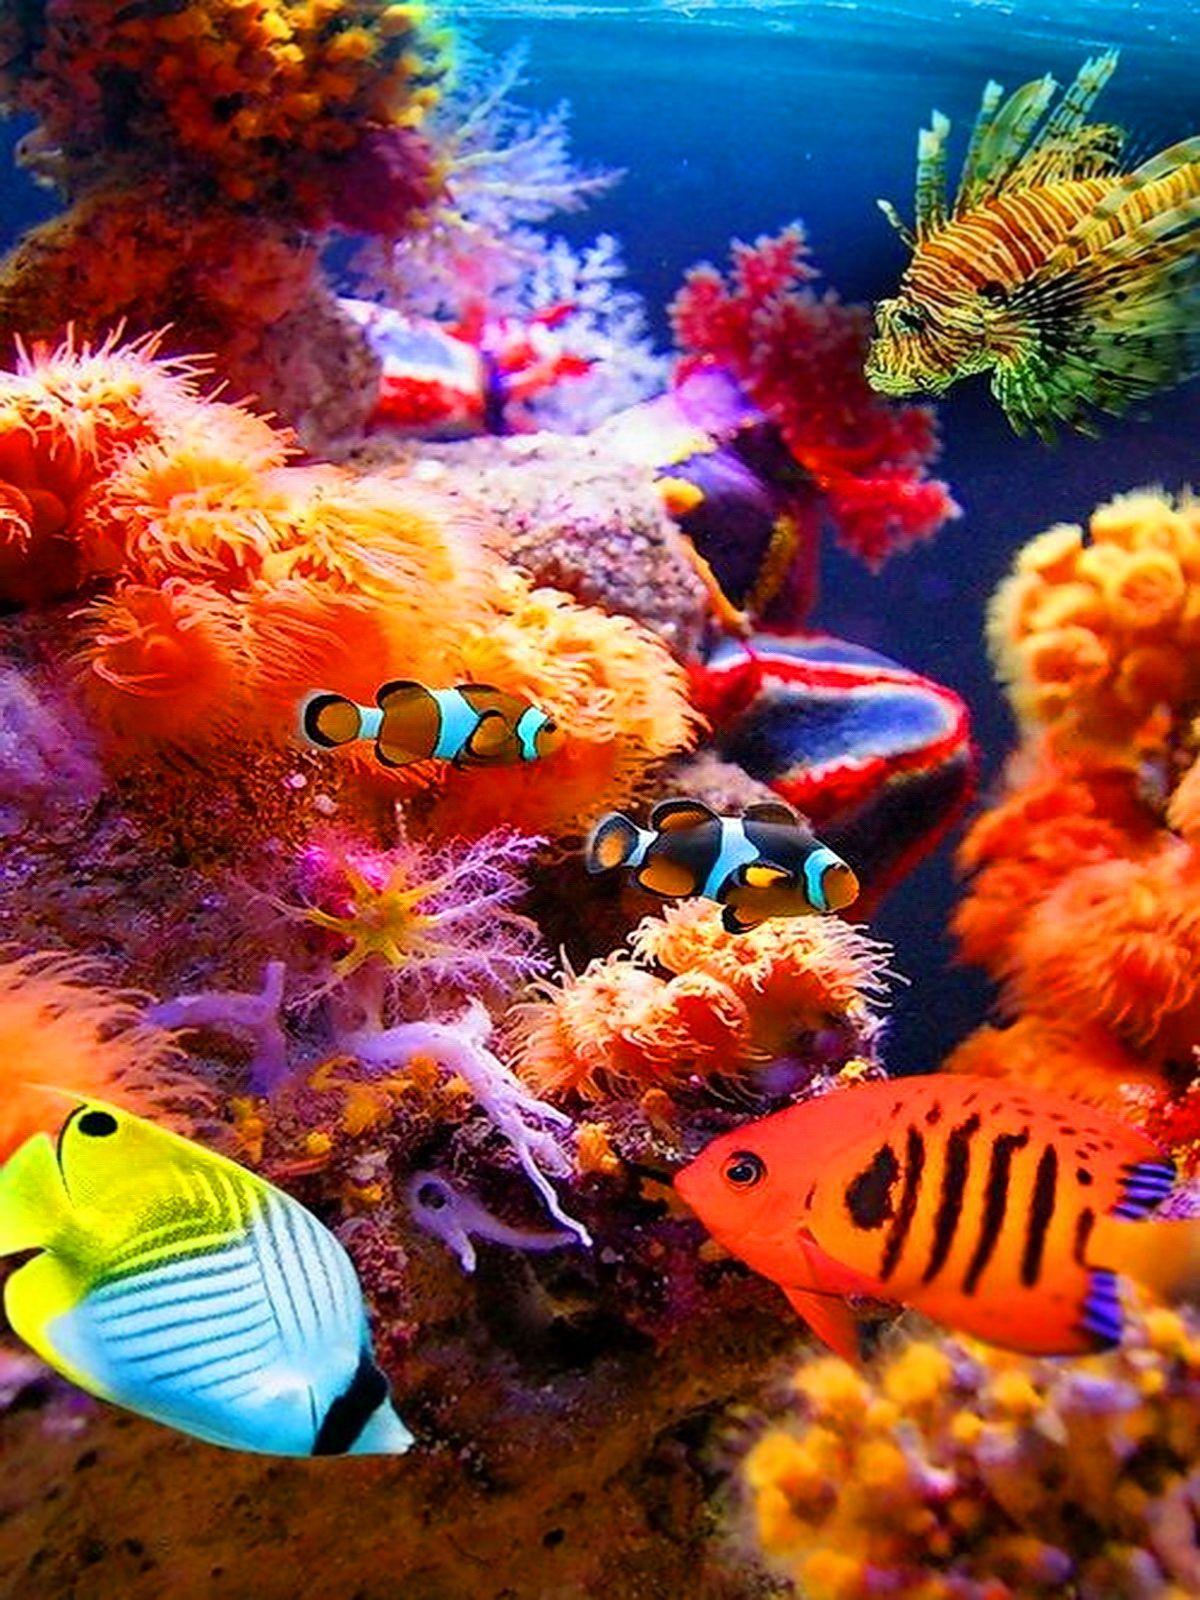 Pin by خالد العبادي Khaled ALabbade on تحت الماء - Underwater ...